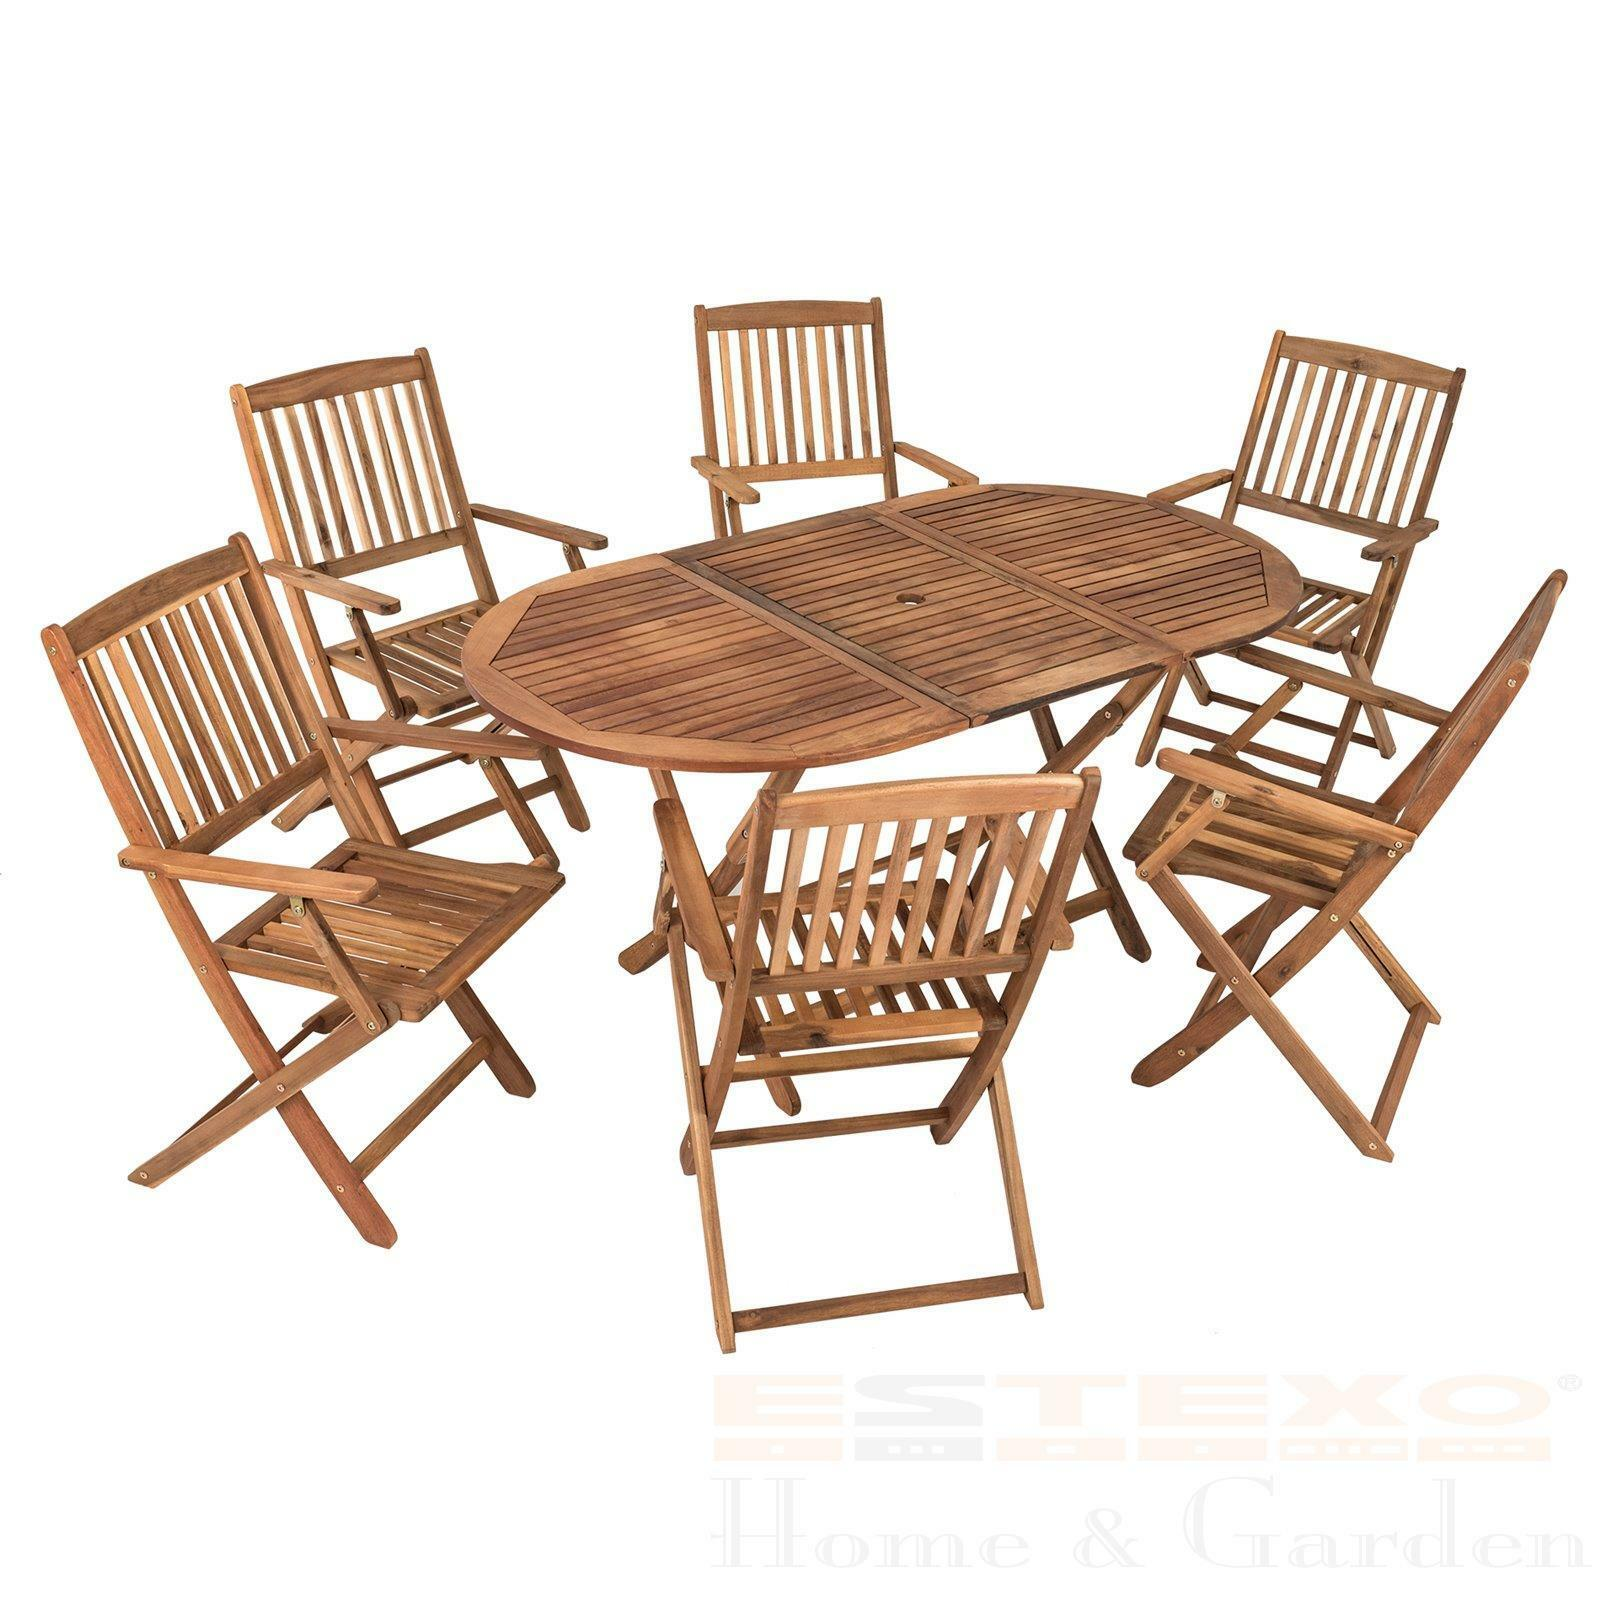 Gartenmöbel Set Holz Sitzgruppe Akazienholz klappbar Gartenmöbel Sitzgarnitur